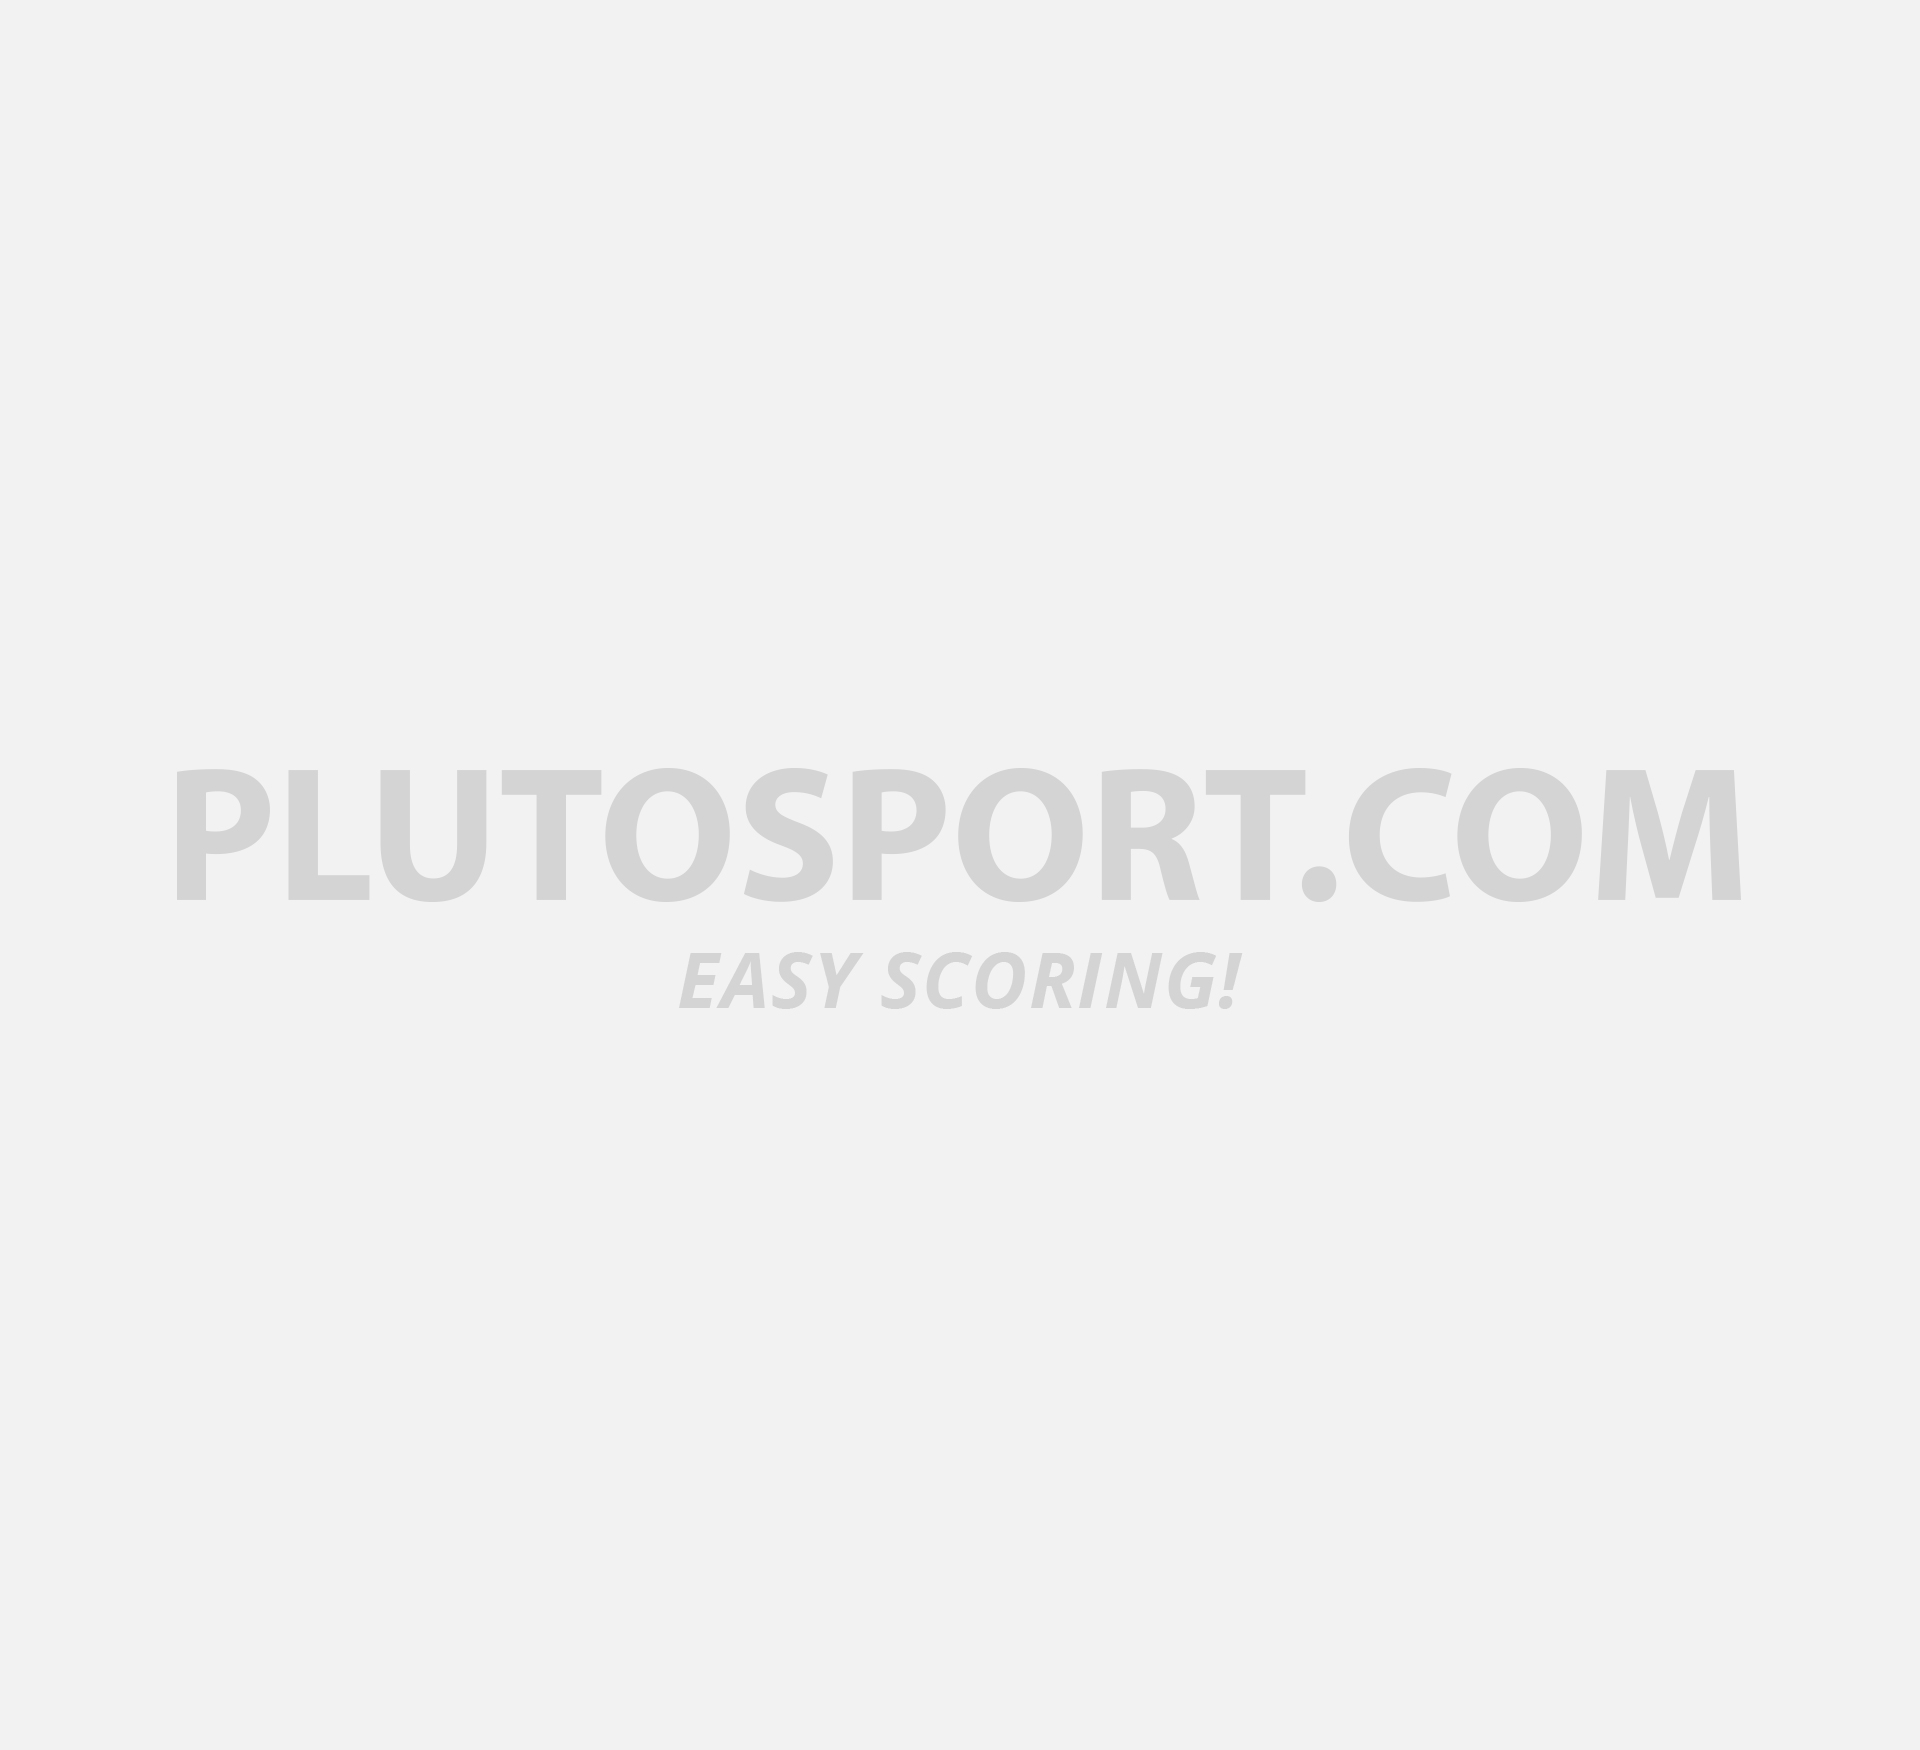 the latest dc9b8 5917b Adidas Crazy Light Boost Basketball Shoes Men - Shoes - Basketball - Sports   Plutosport